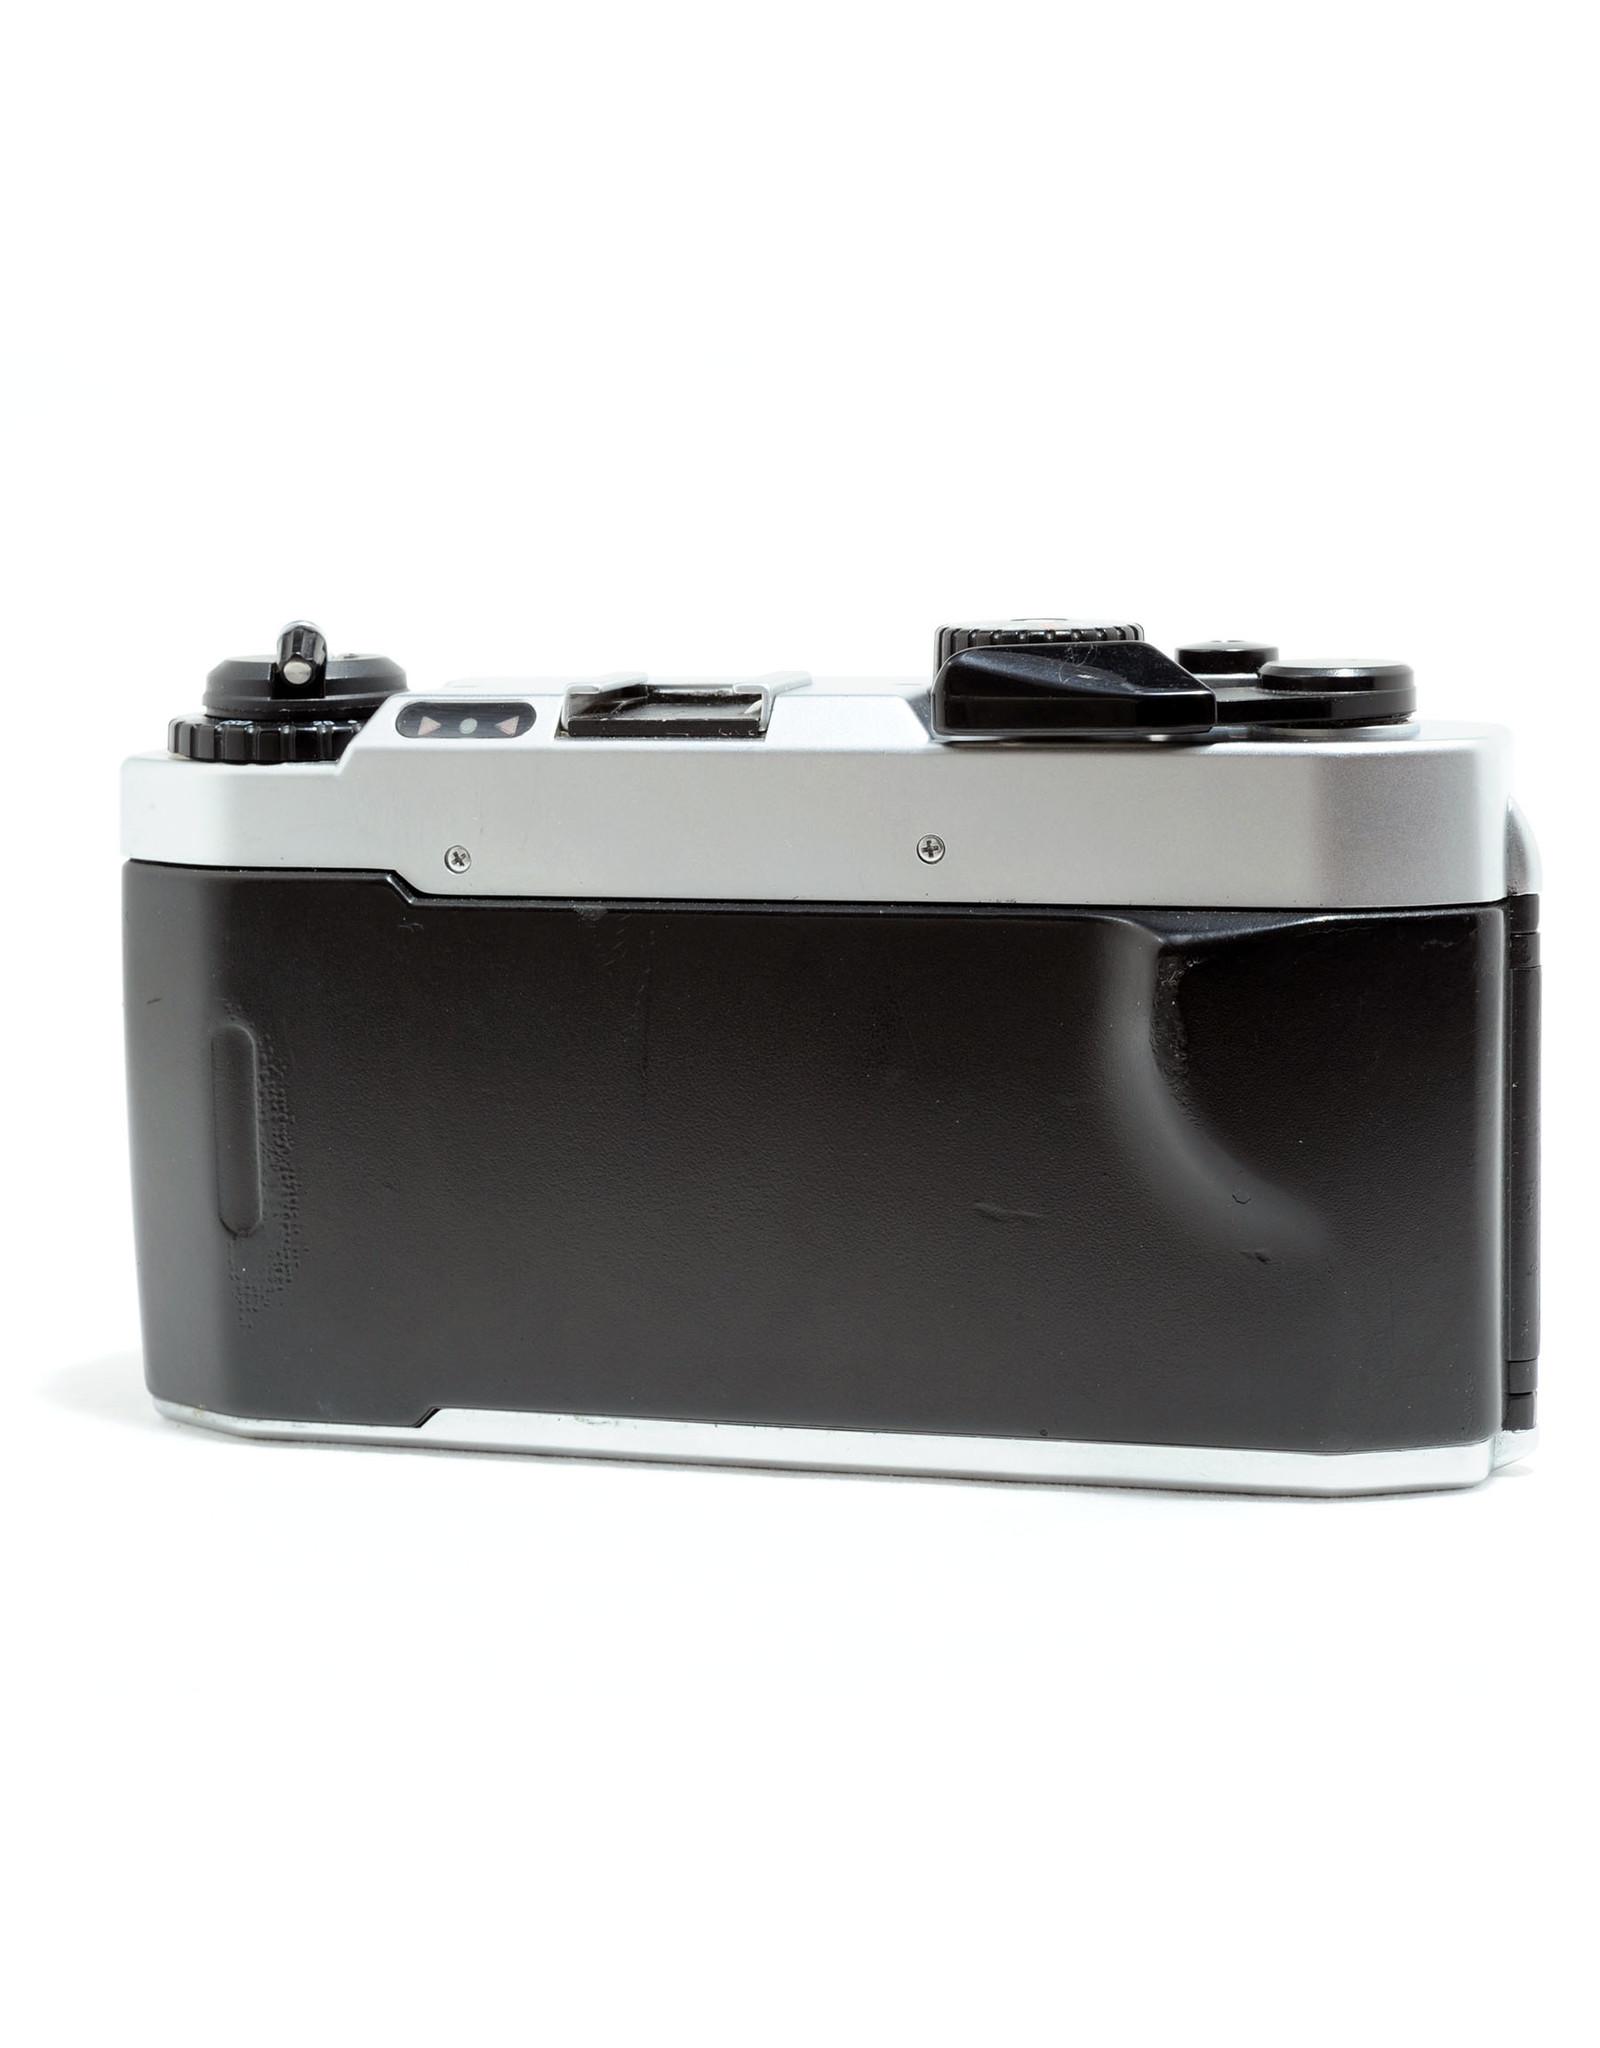 Voigtlander Bessa L Silver   AP2031205